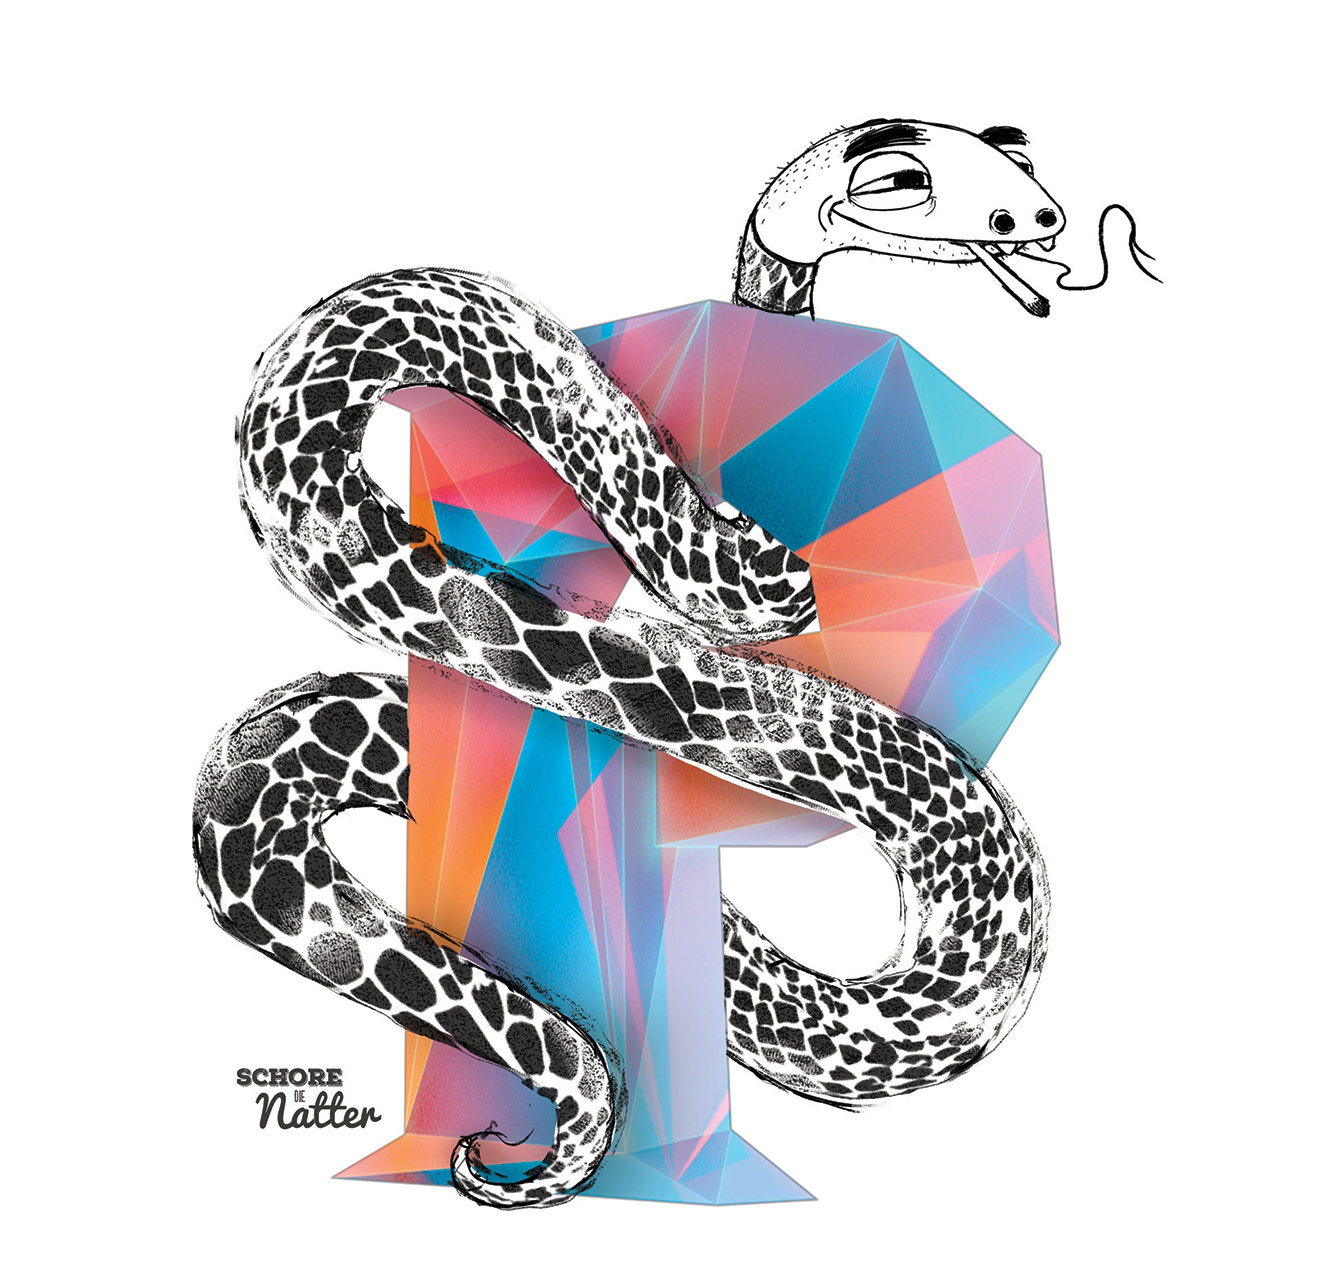 Snake – collaboration with Fabian Grodde